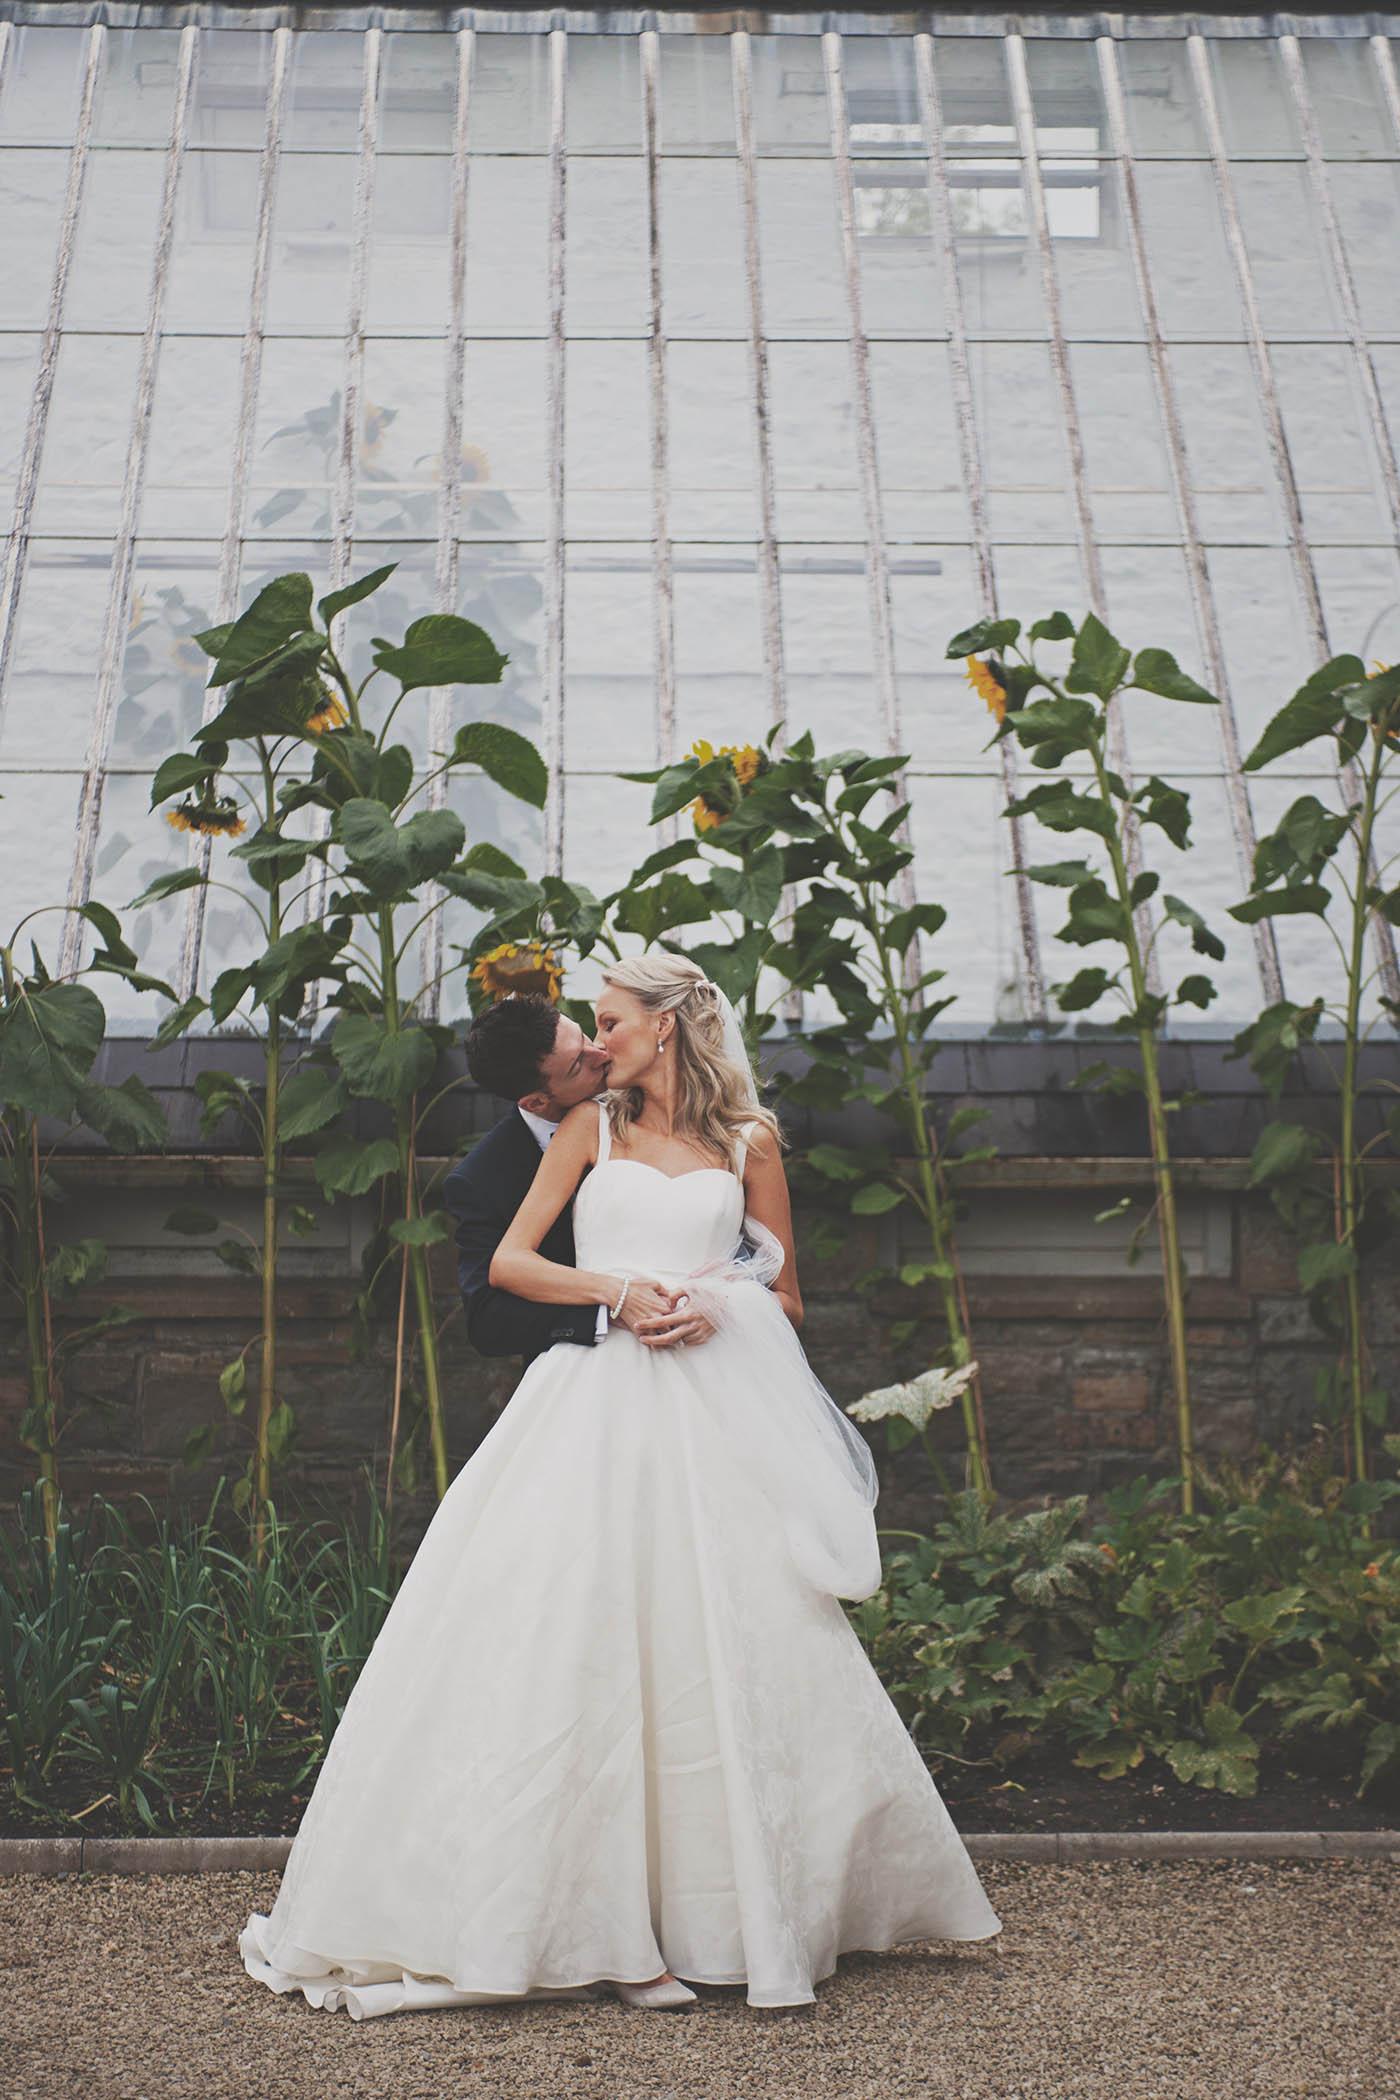 Lough Rynn Castle wedding, green house, married couple